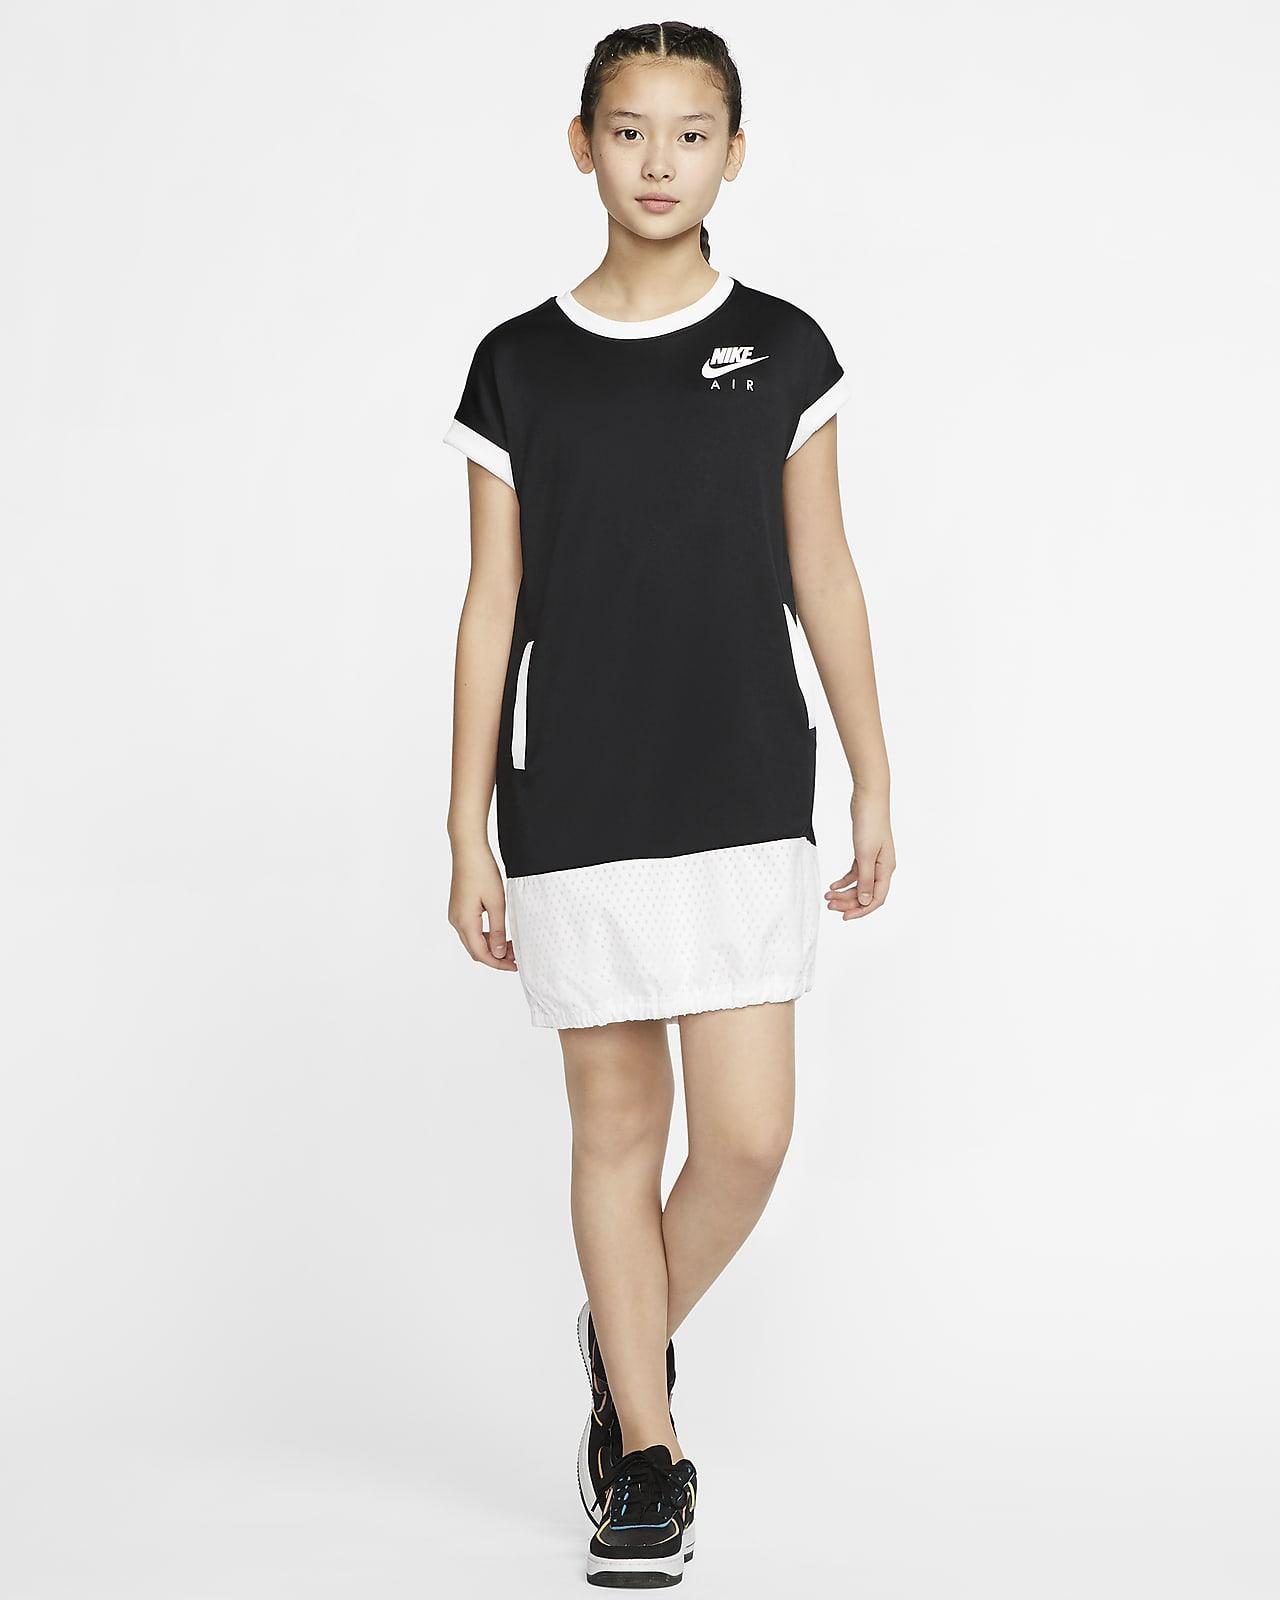 Robe A Manches Courtes Nike Air Pour Fille Plus Agee Nike Ch